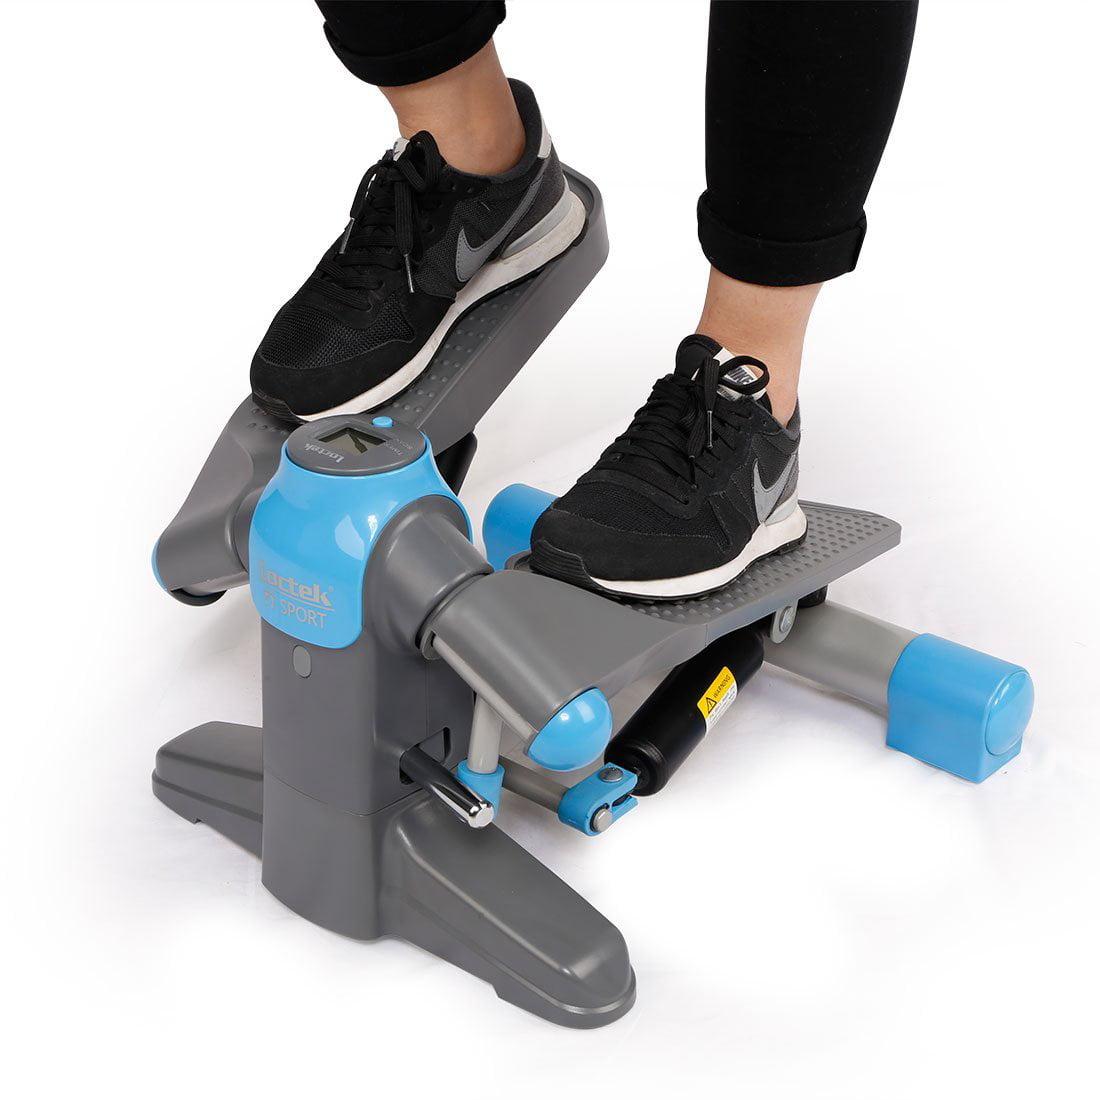 Exercise Mini Stepper Machine Mini Twister Step Elliptical Trainer